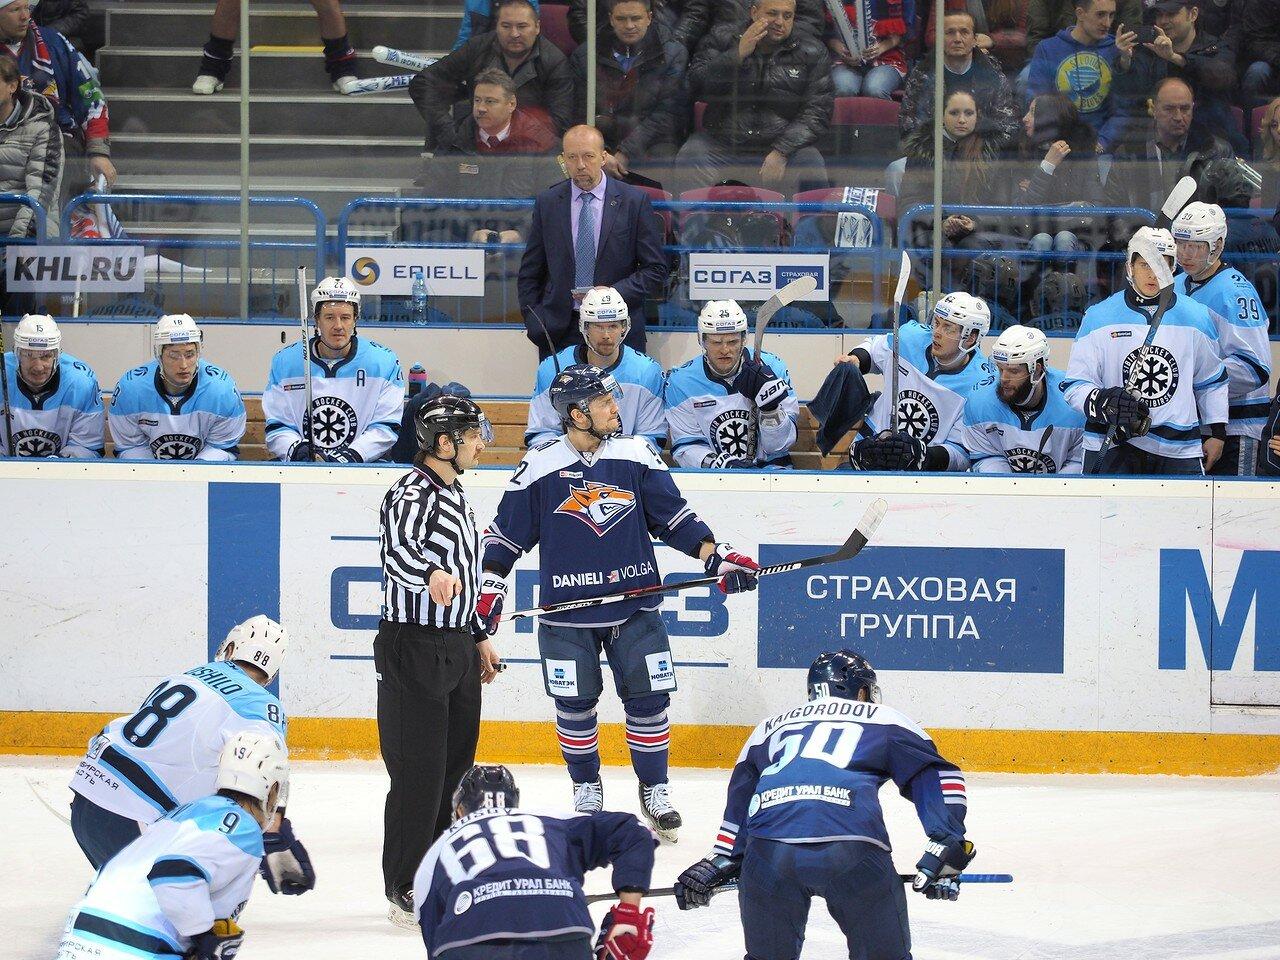 64Плей-офф 2016 Восток 1/2 Металлург - Сибирь 10.03.2016